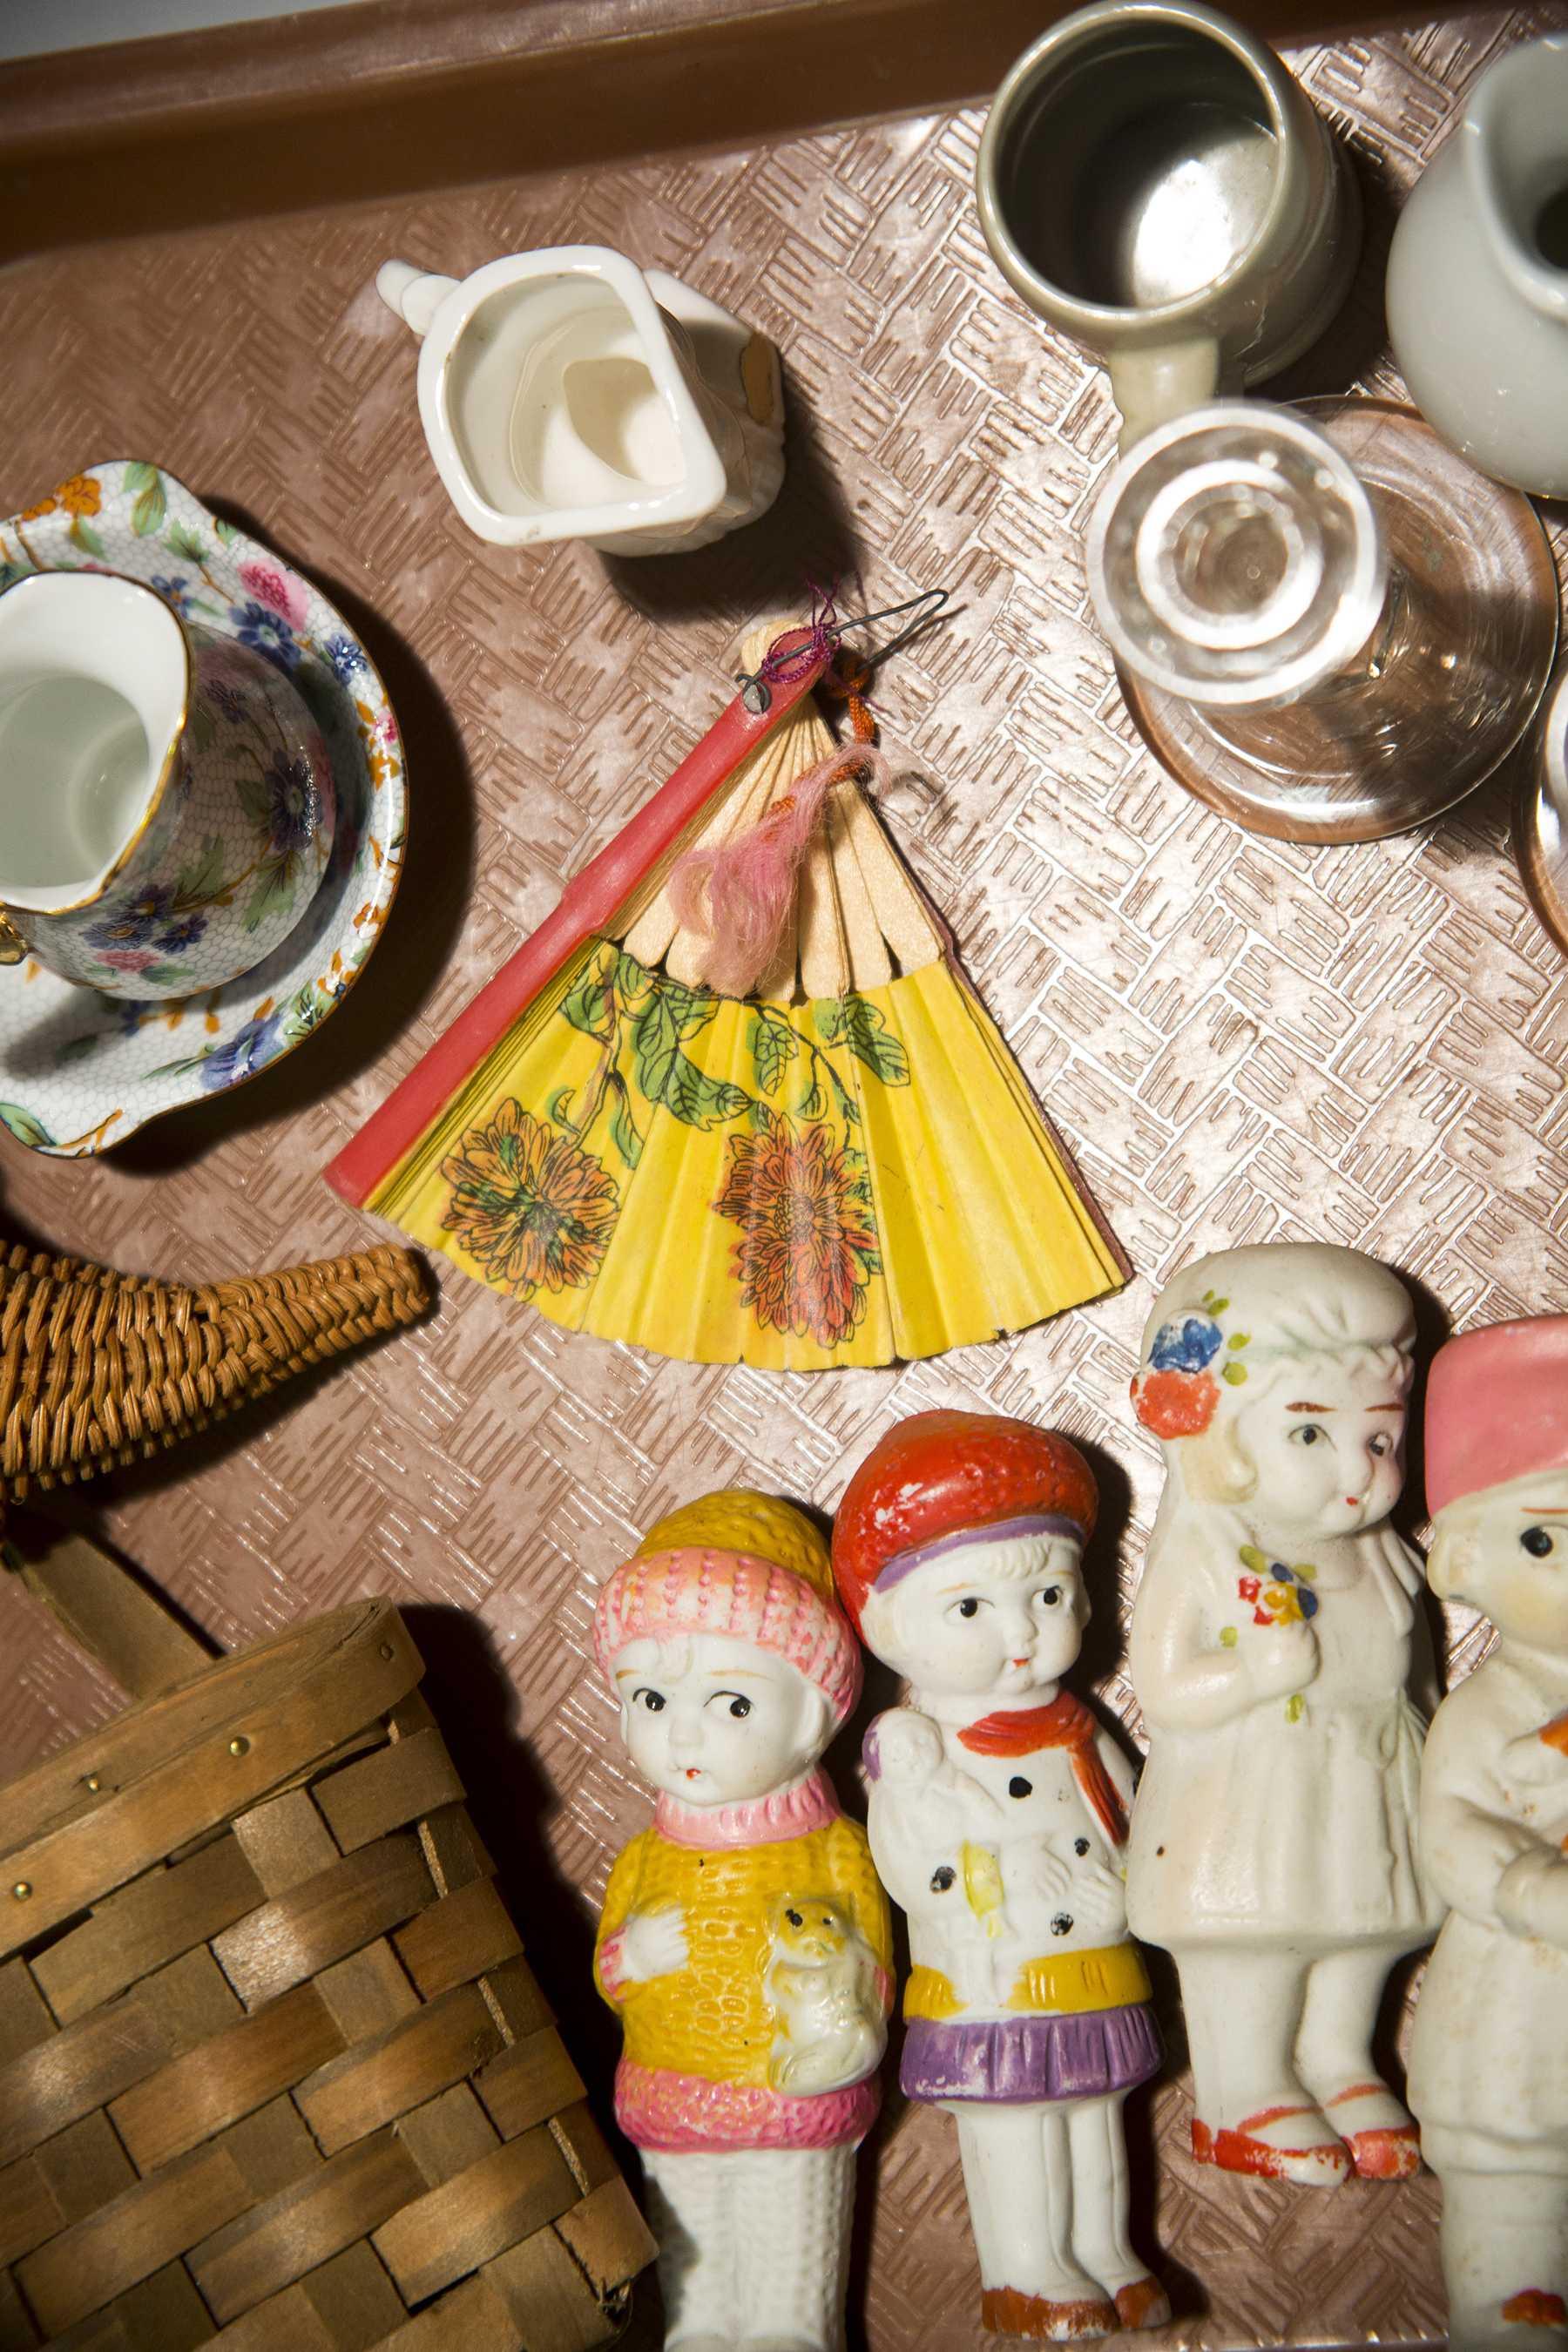 50 Piece China Doll House Lot